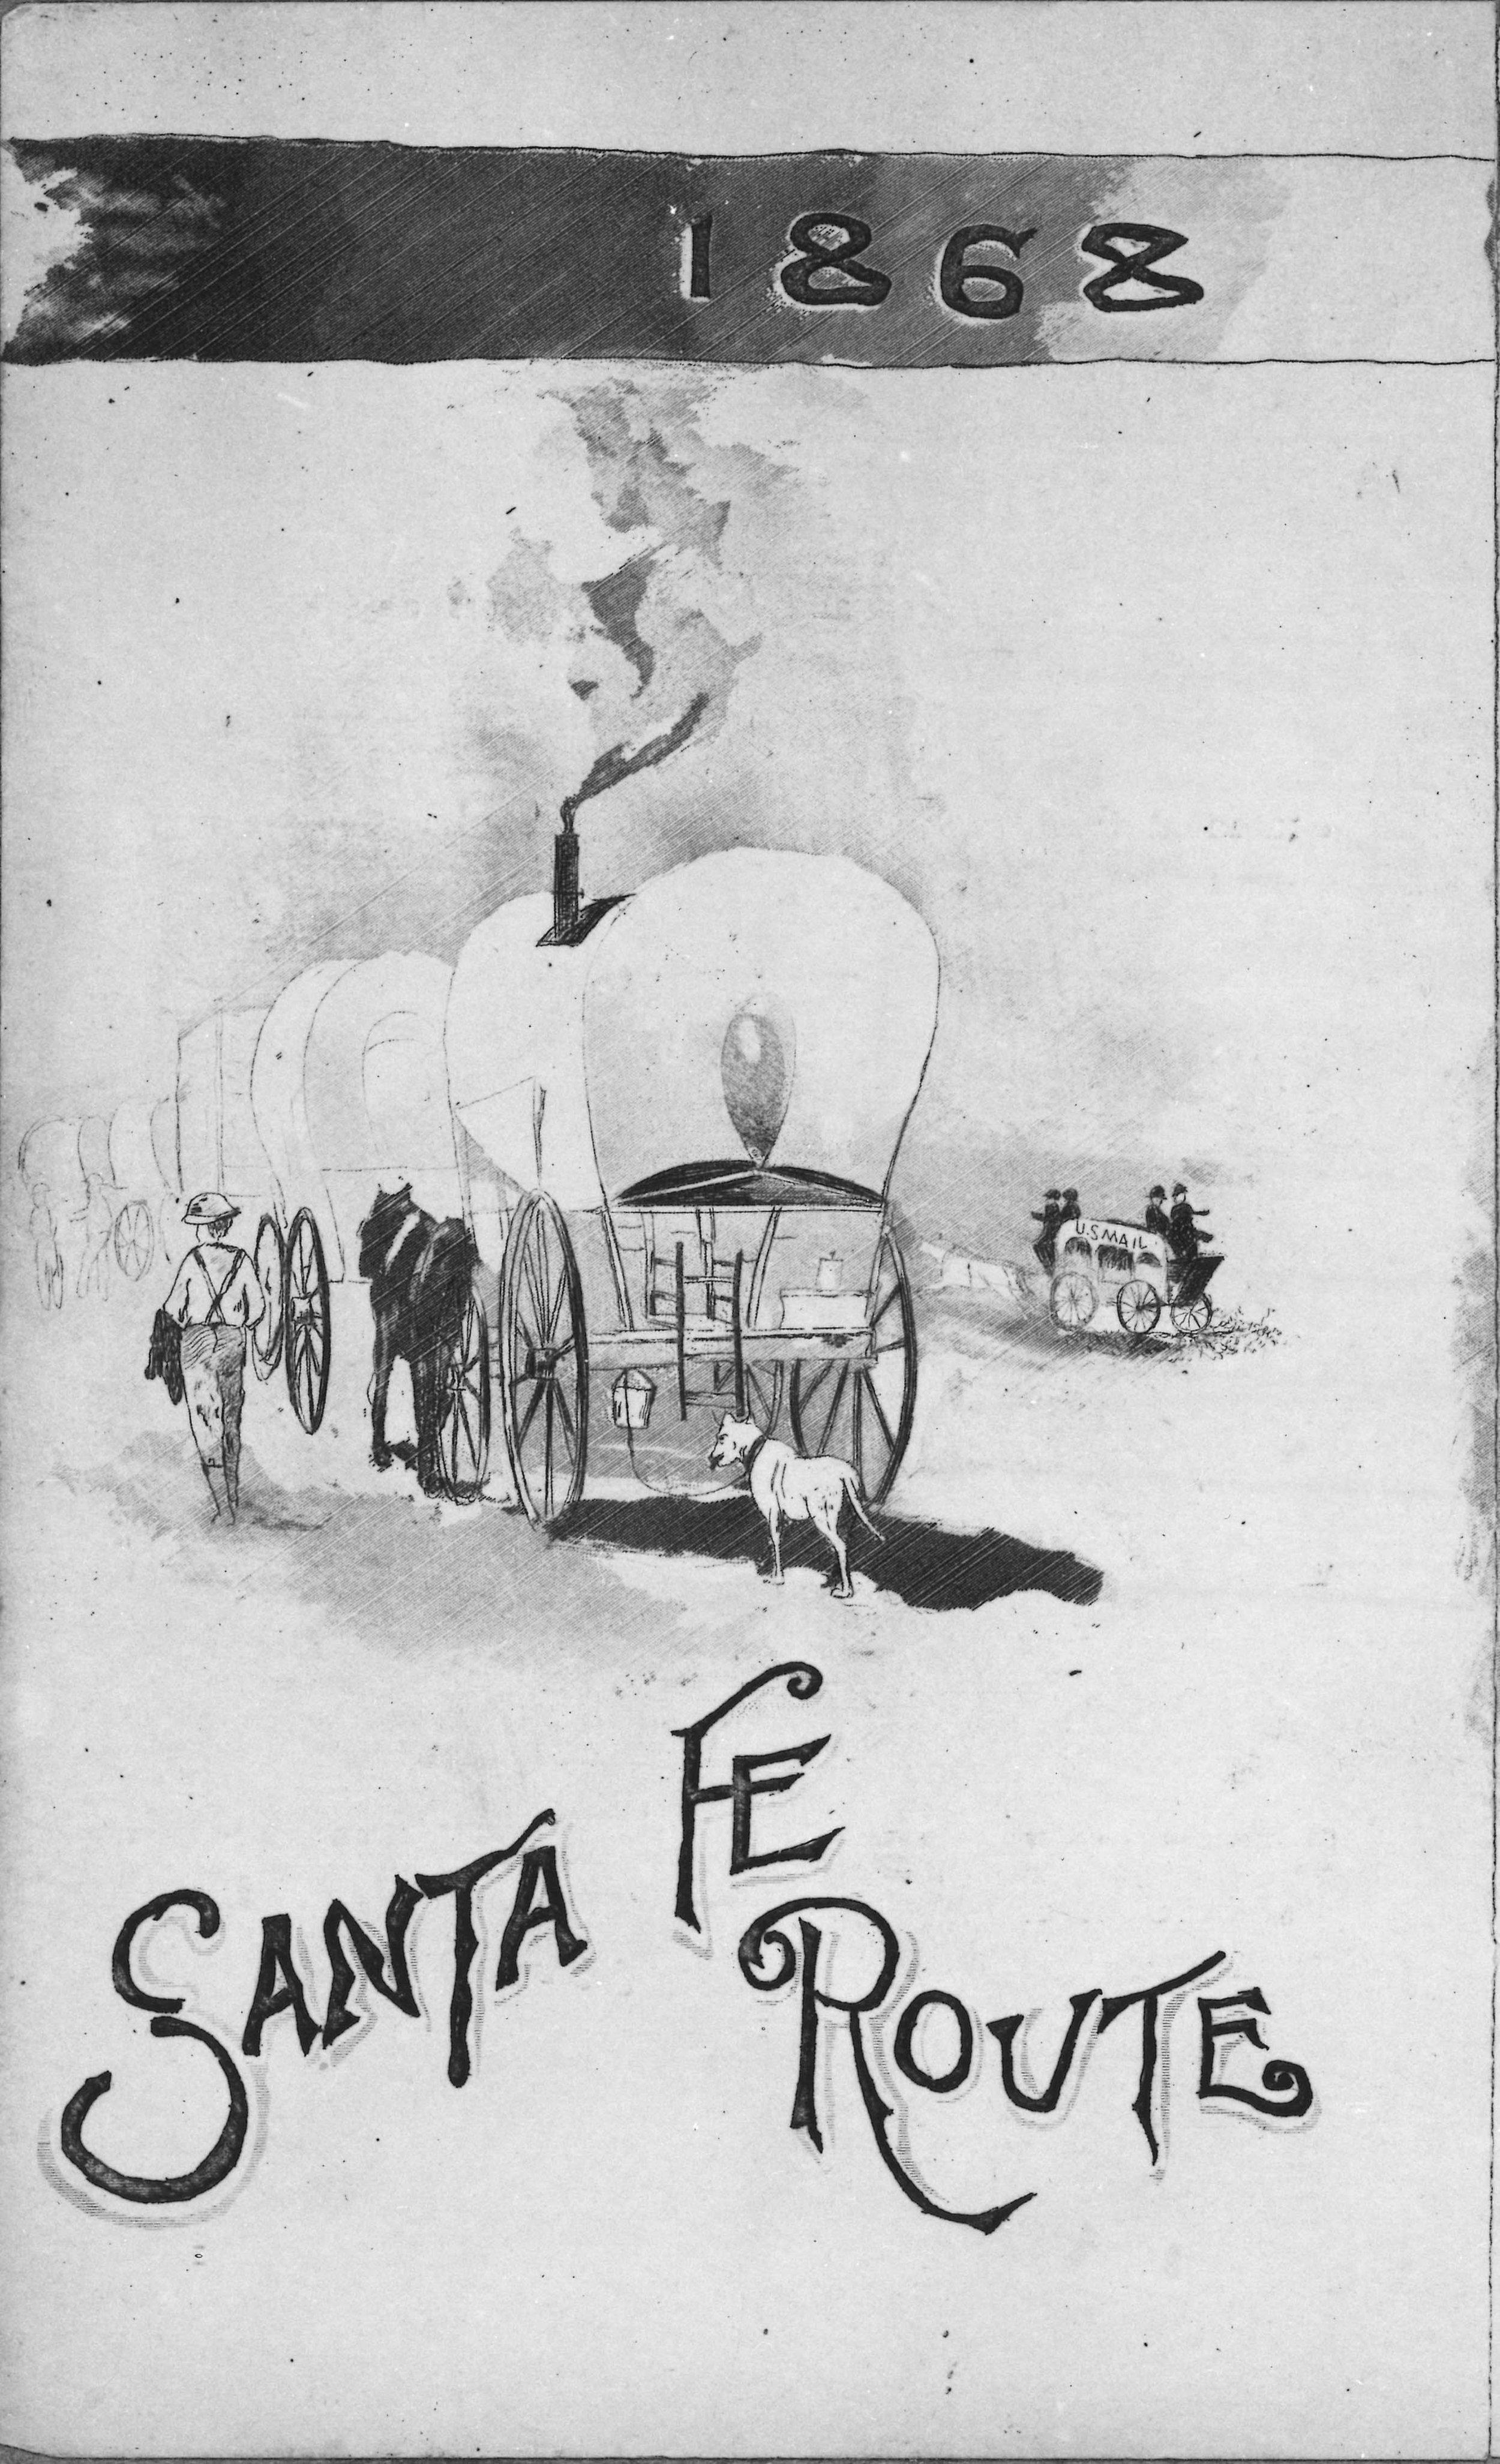 Santa Fe Route 1888 Menu_sm3.jpg